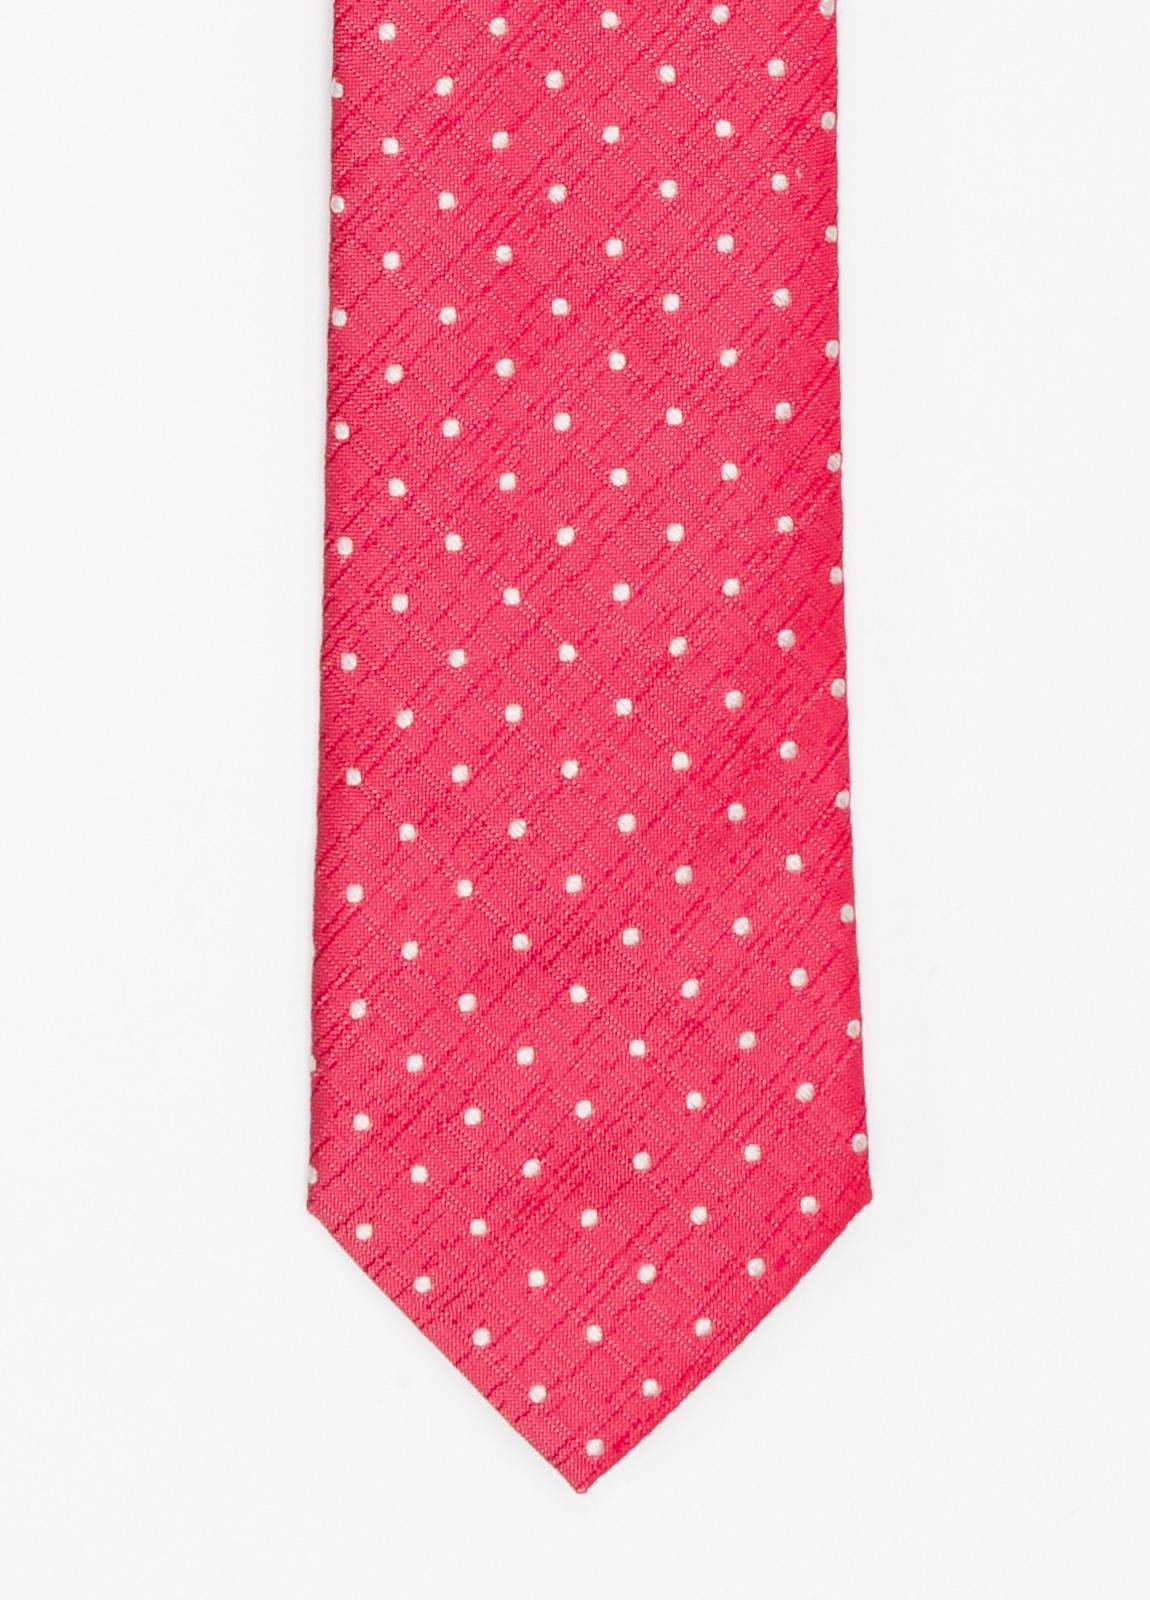 Corbata Formal Wear micro textura topito color rojo. Pala 7,5 cm. 100% Seda.